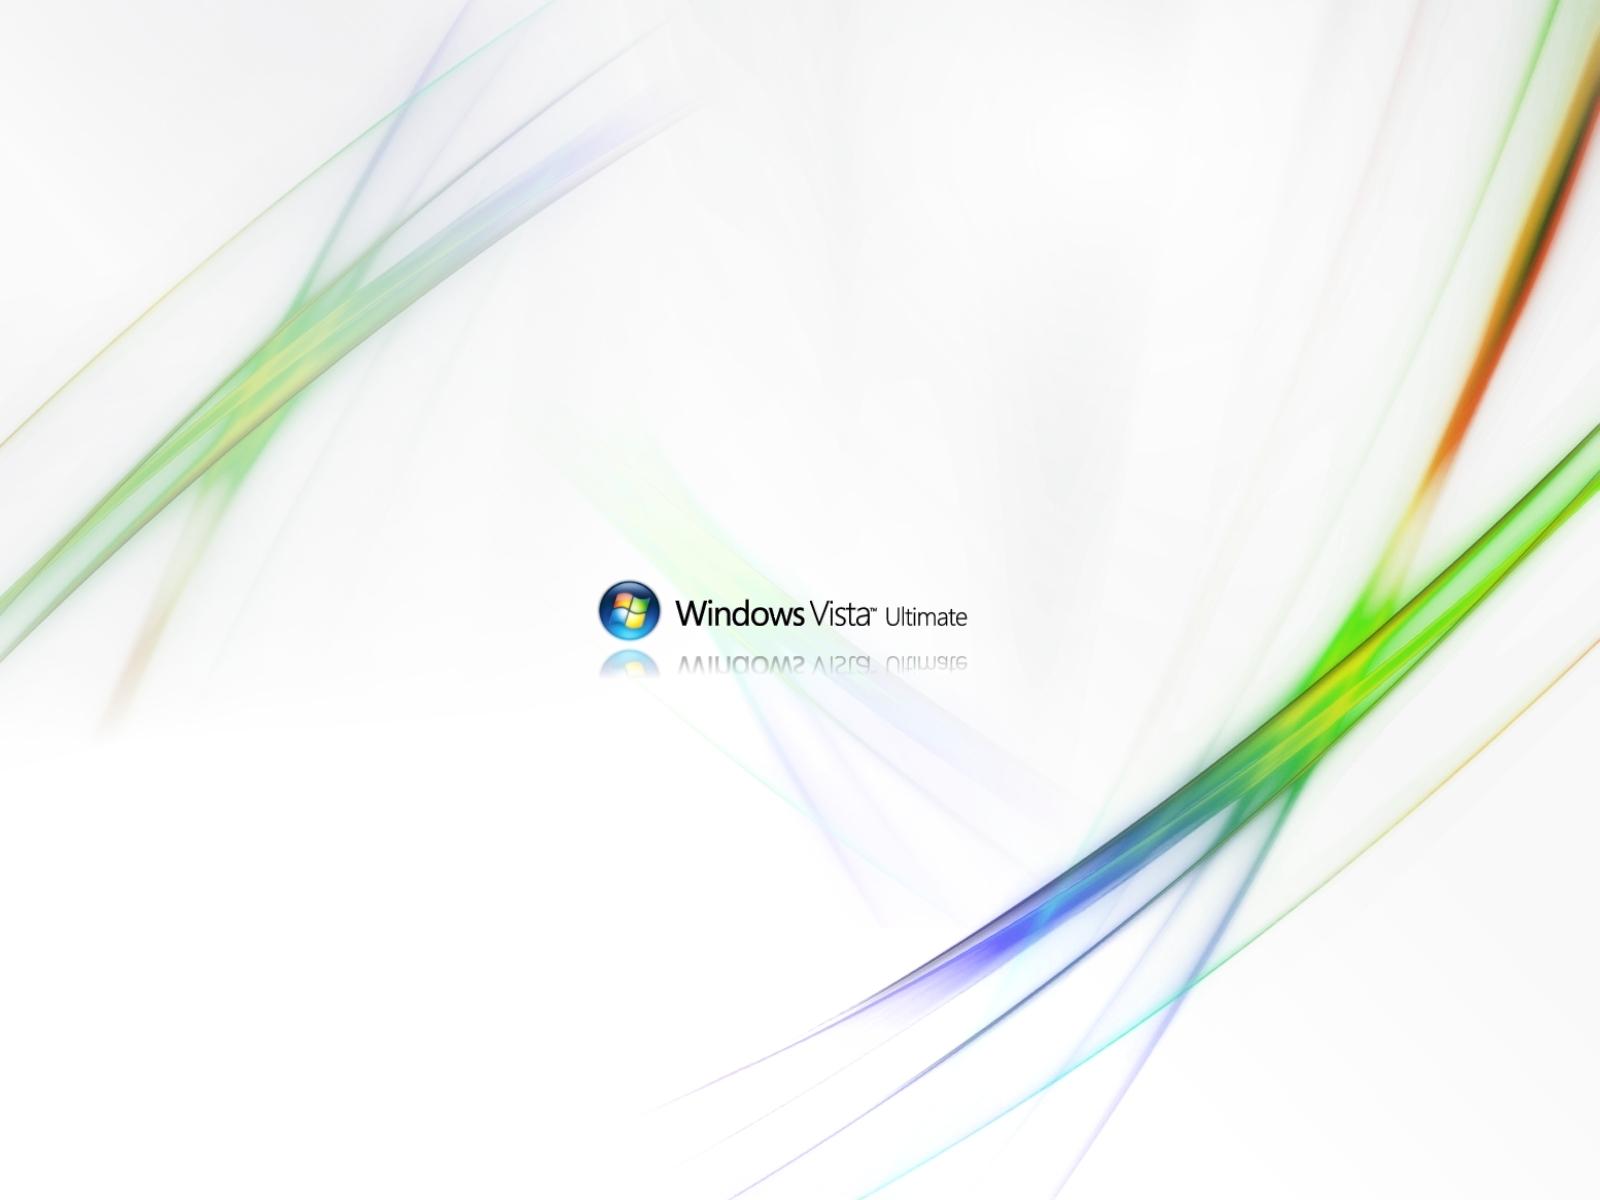 Windows 7 White Wallpapers 3D Wallpaper Nature Wallpaper 1600x1200